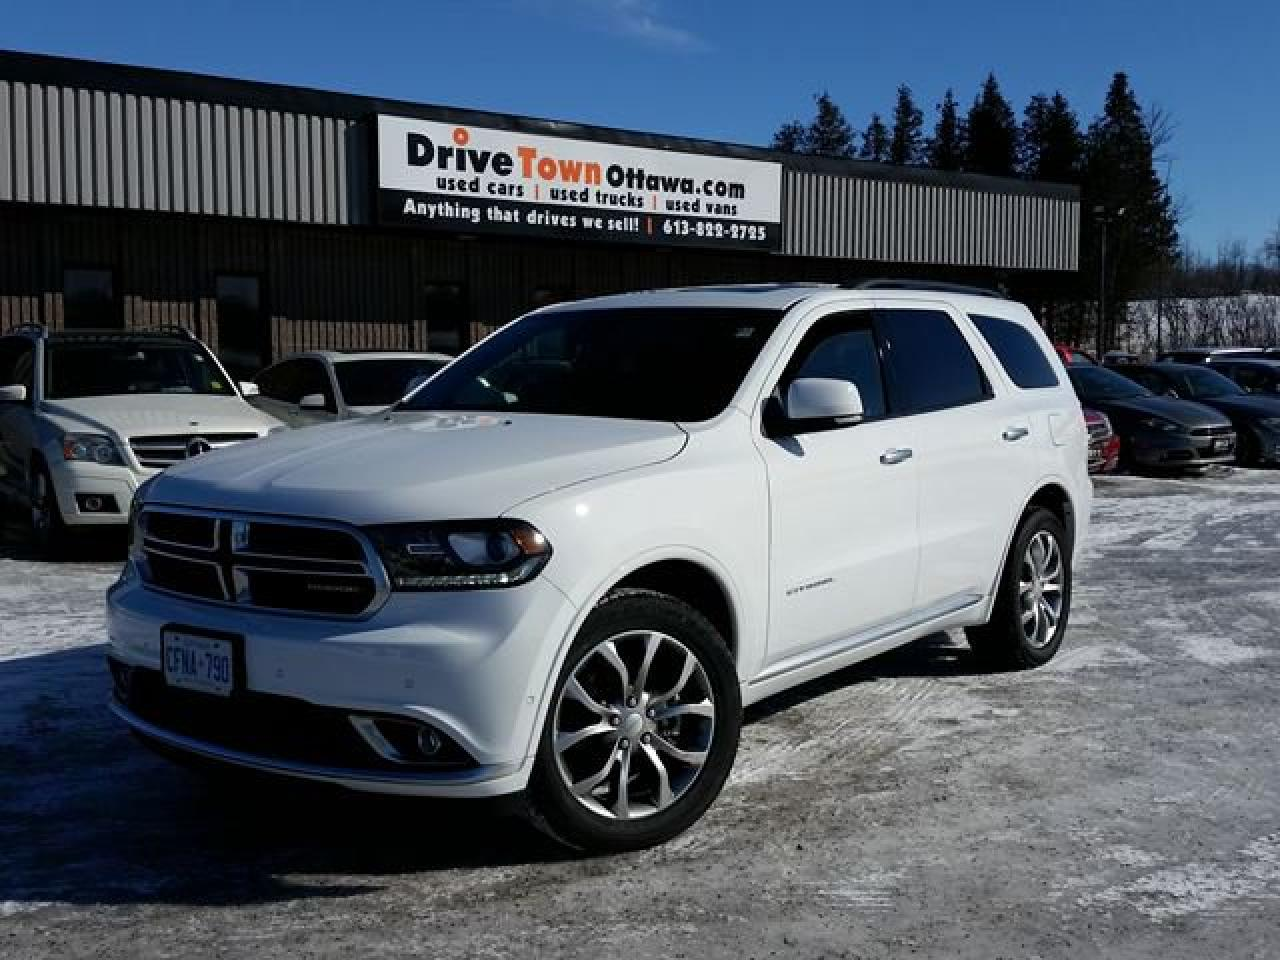 2018 Dodge Durango Citadel Platinum Edition AWD **TOP OF THE LINE**